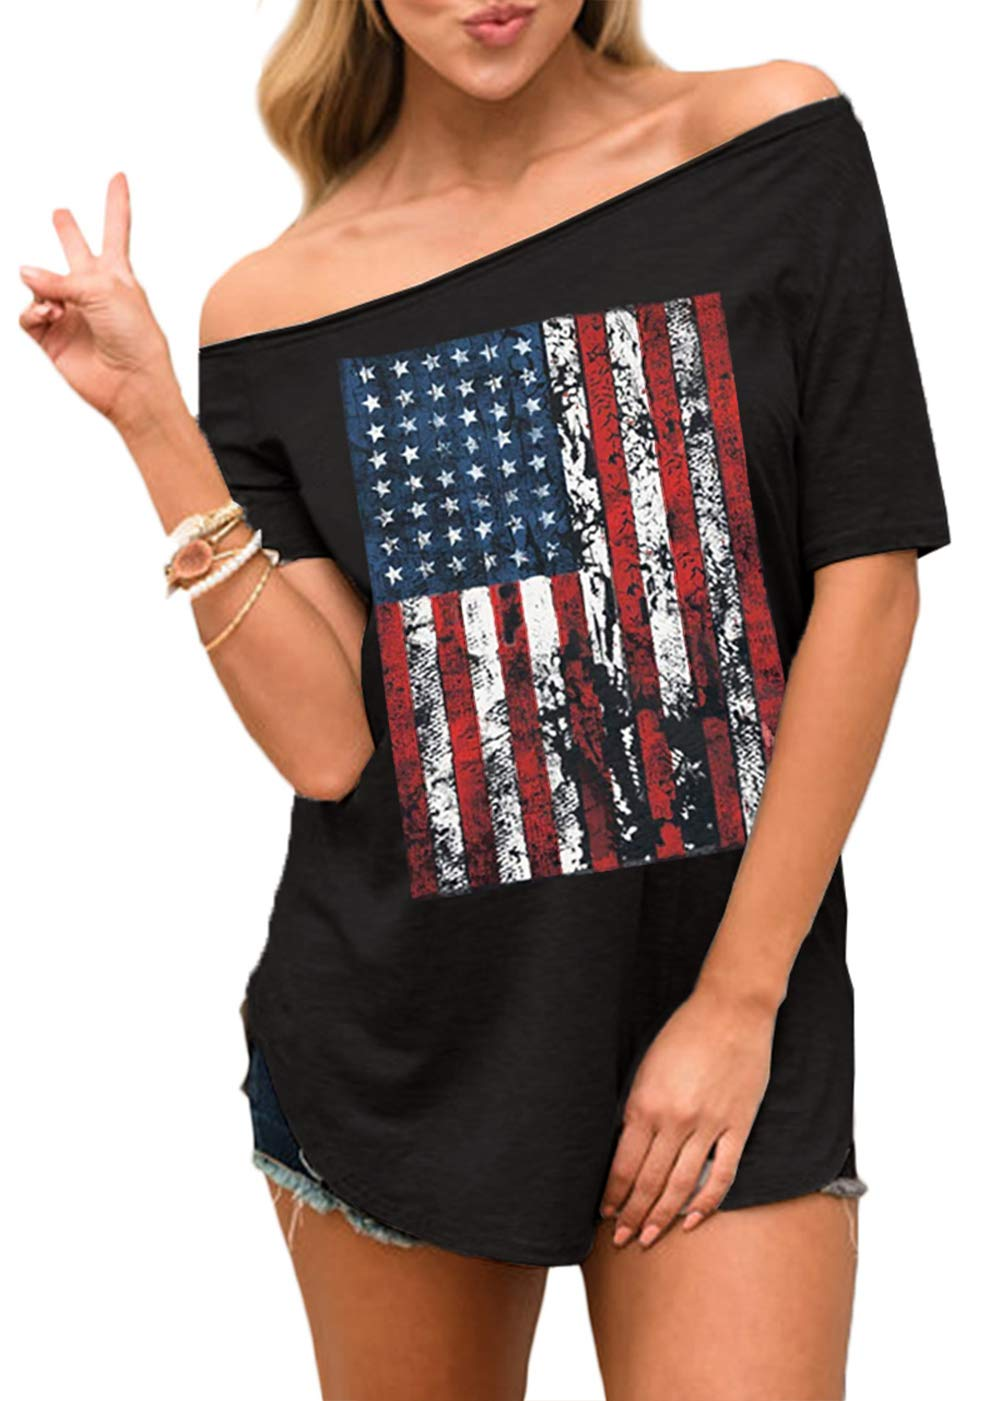 Spadehill Women's July 4th American Flag Off Shoulder Tops